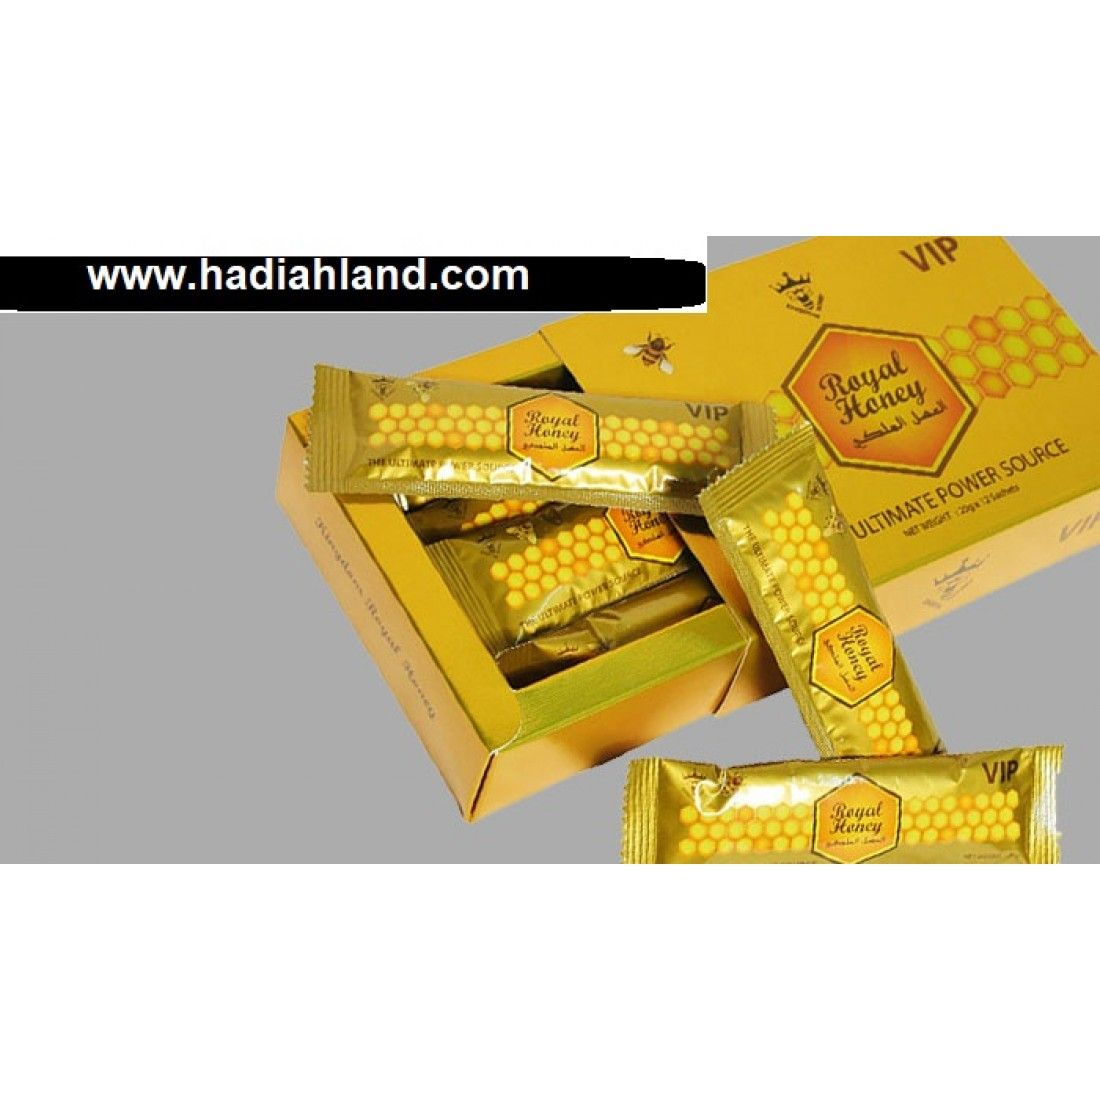 Golden Royal Honey Vip Original Wholesale Malaysia Price Royal Pure Products The Originals